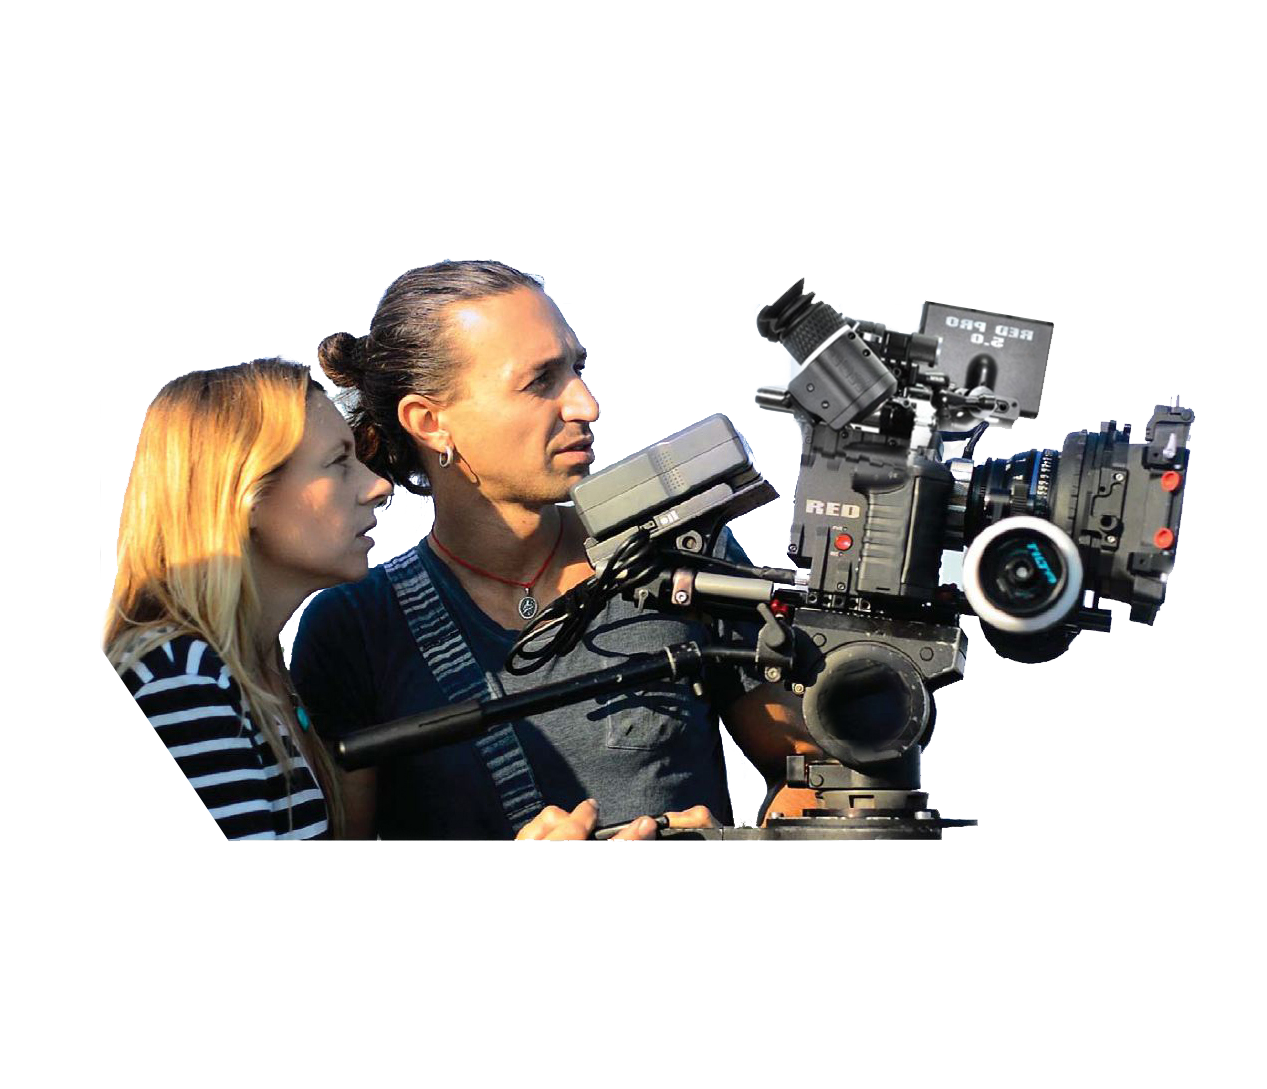 EvaGermanStudio - video & finance 054-361-0384 Germanphoto & creation 054-357-4114 Evamail@evagermanstudio.com